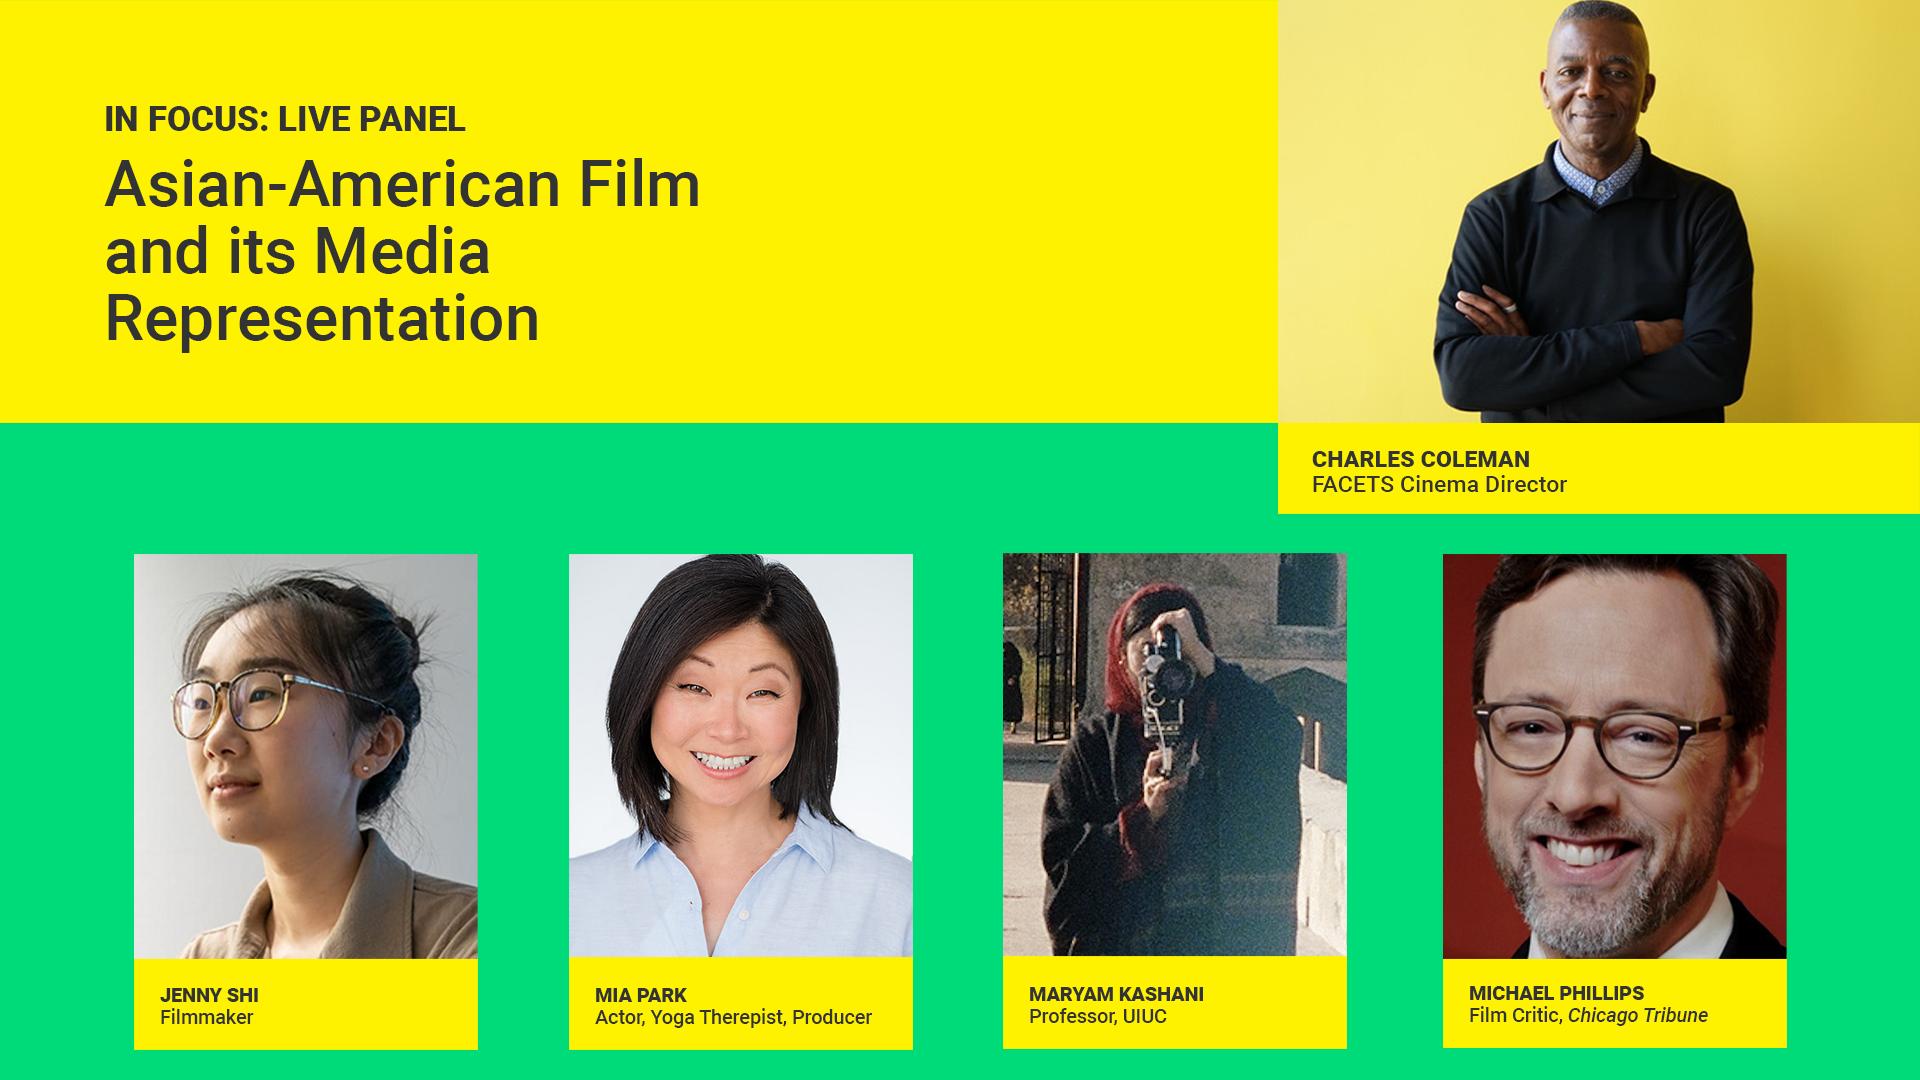 IN FOCUS: Asian-American Film and its Media Representation